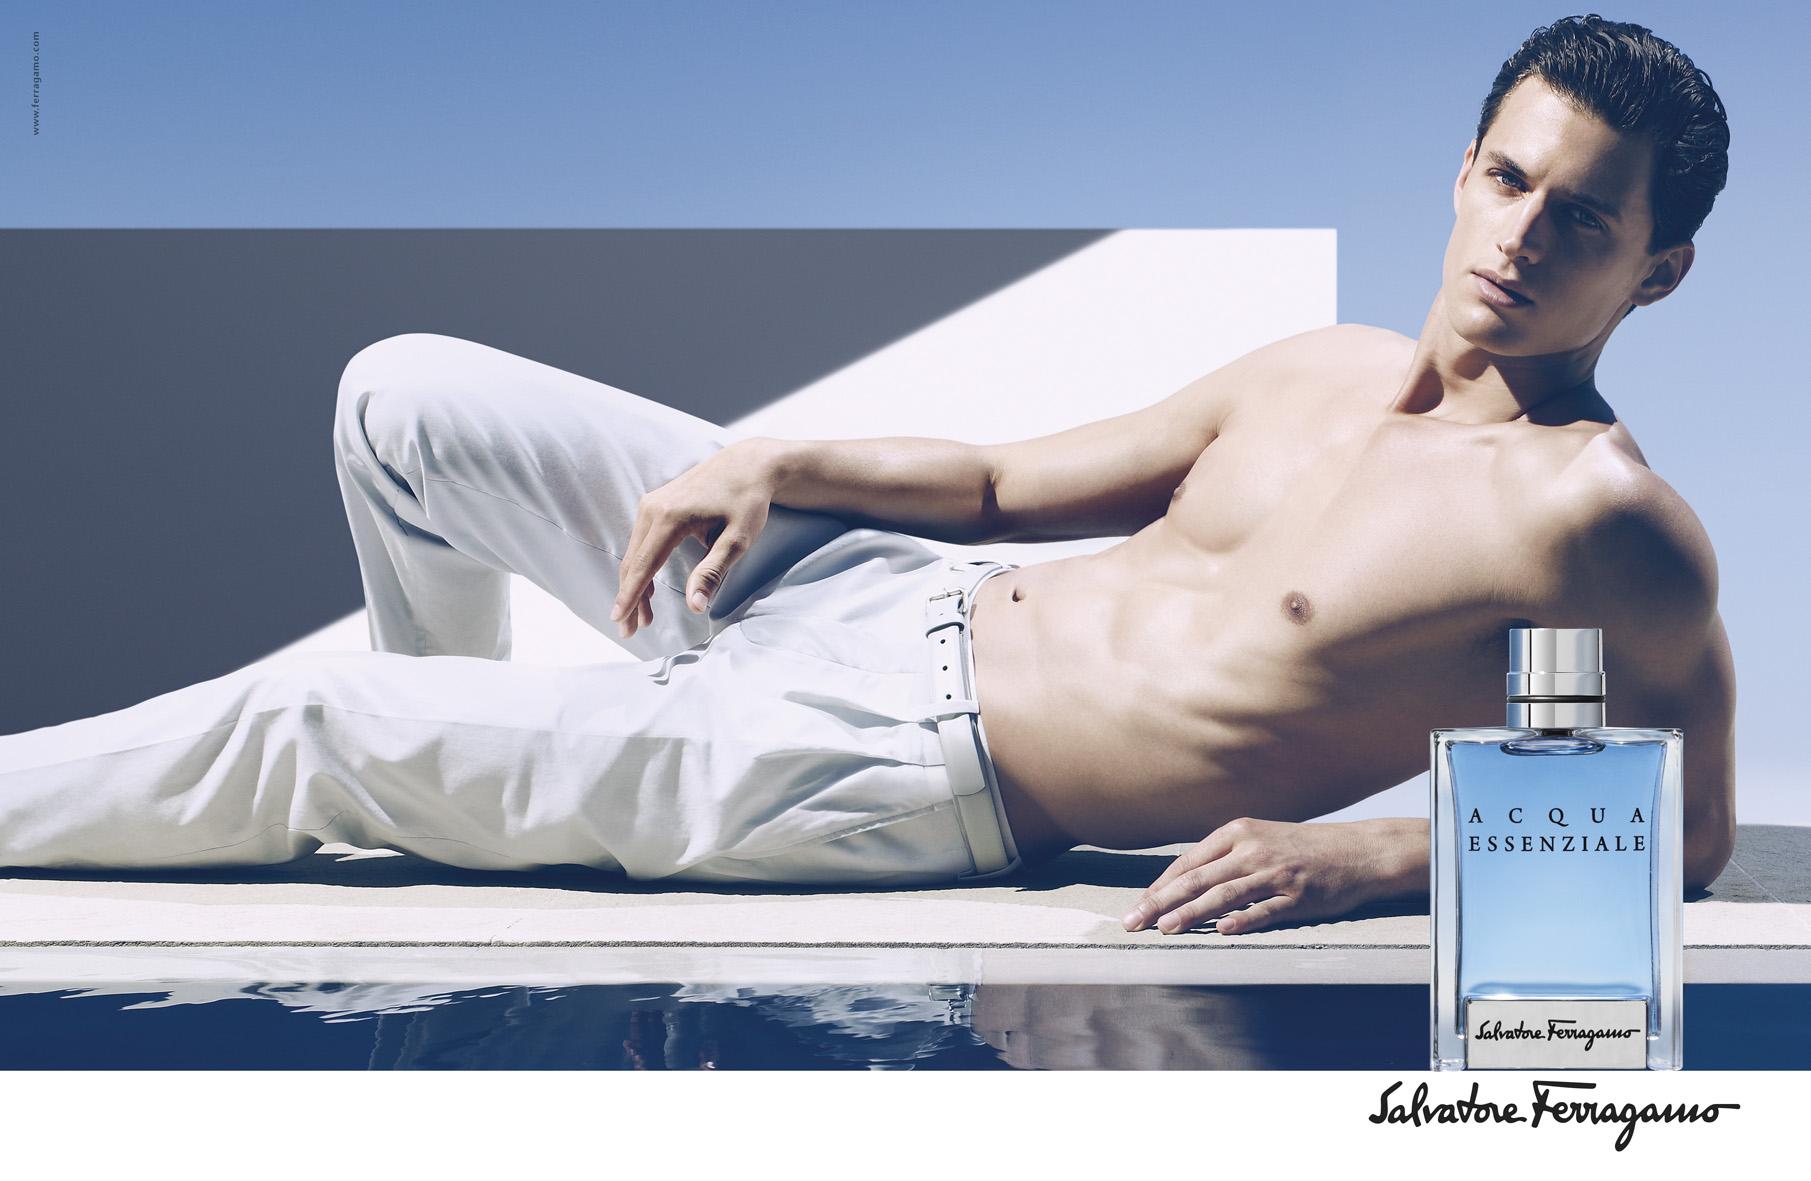 Salvatore Ferragamo Acqua Essenziale-model-1.jpg